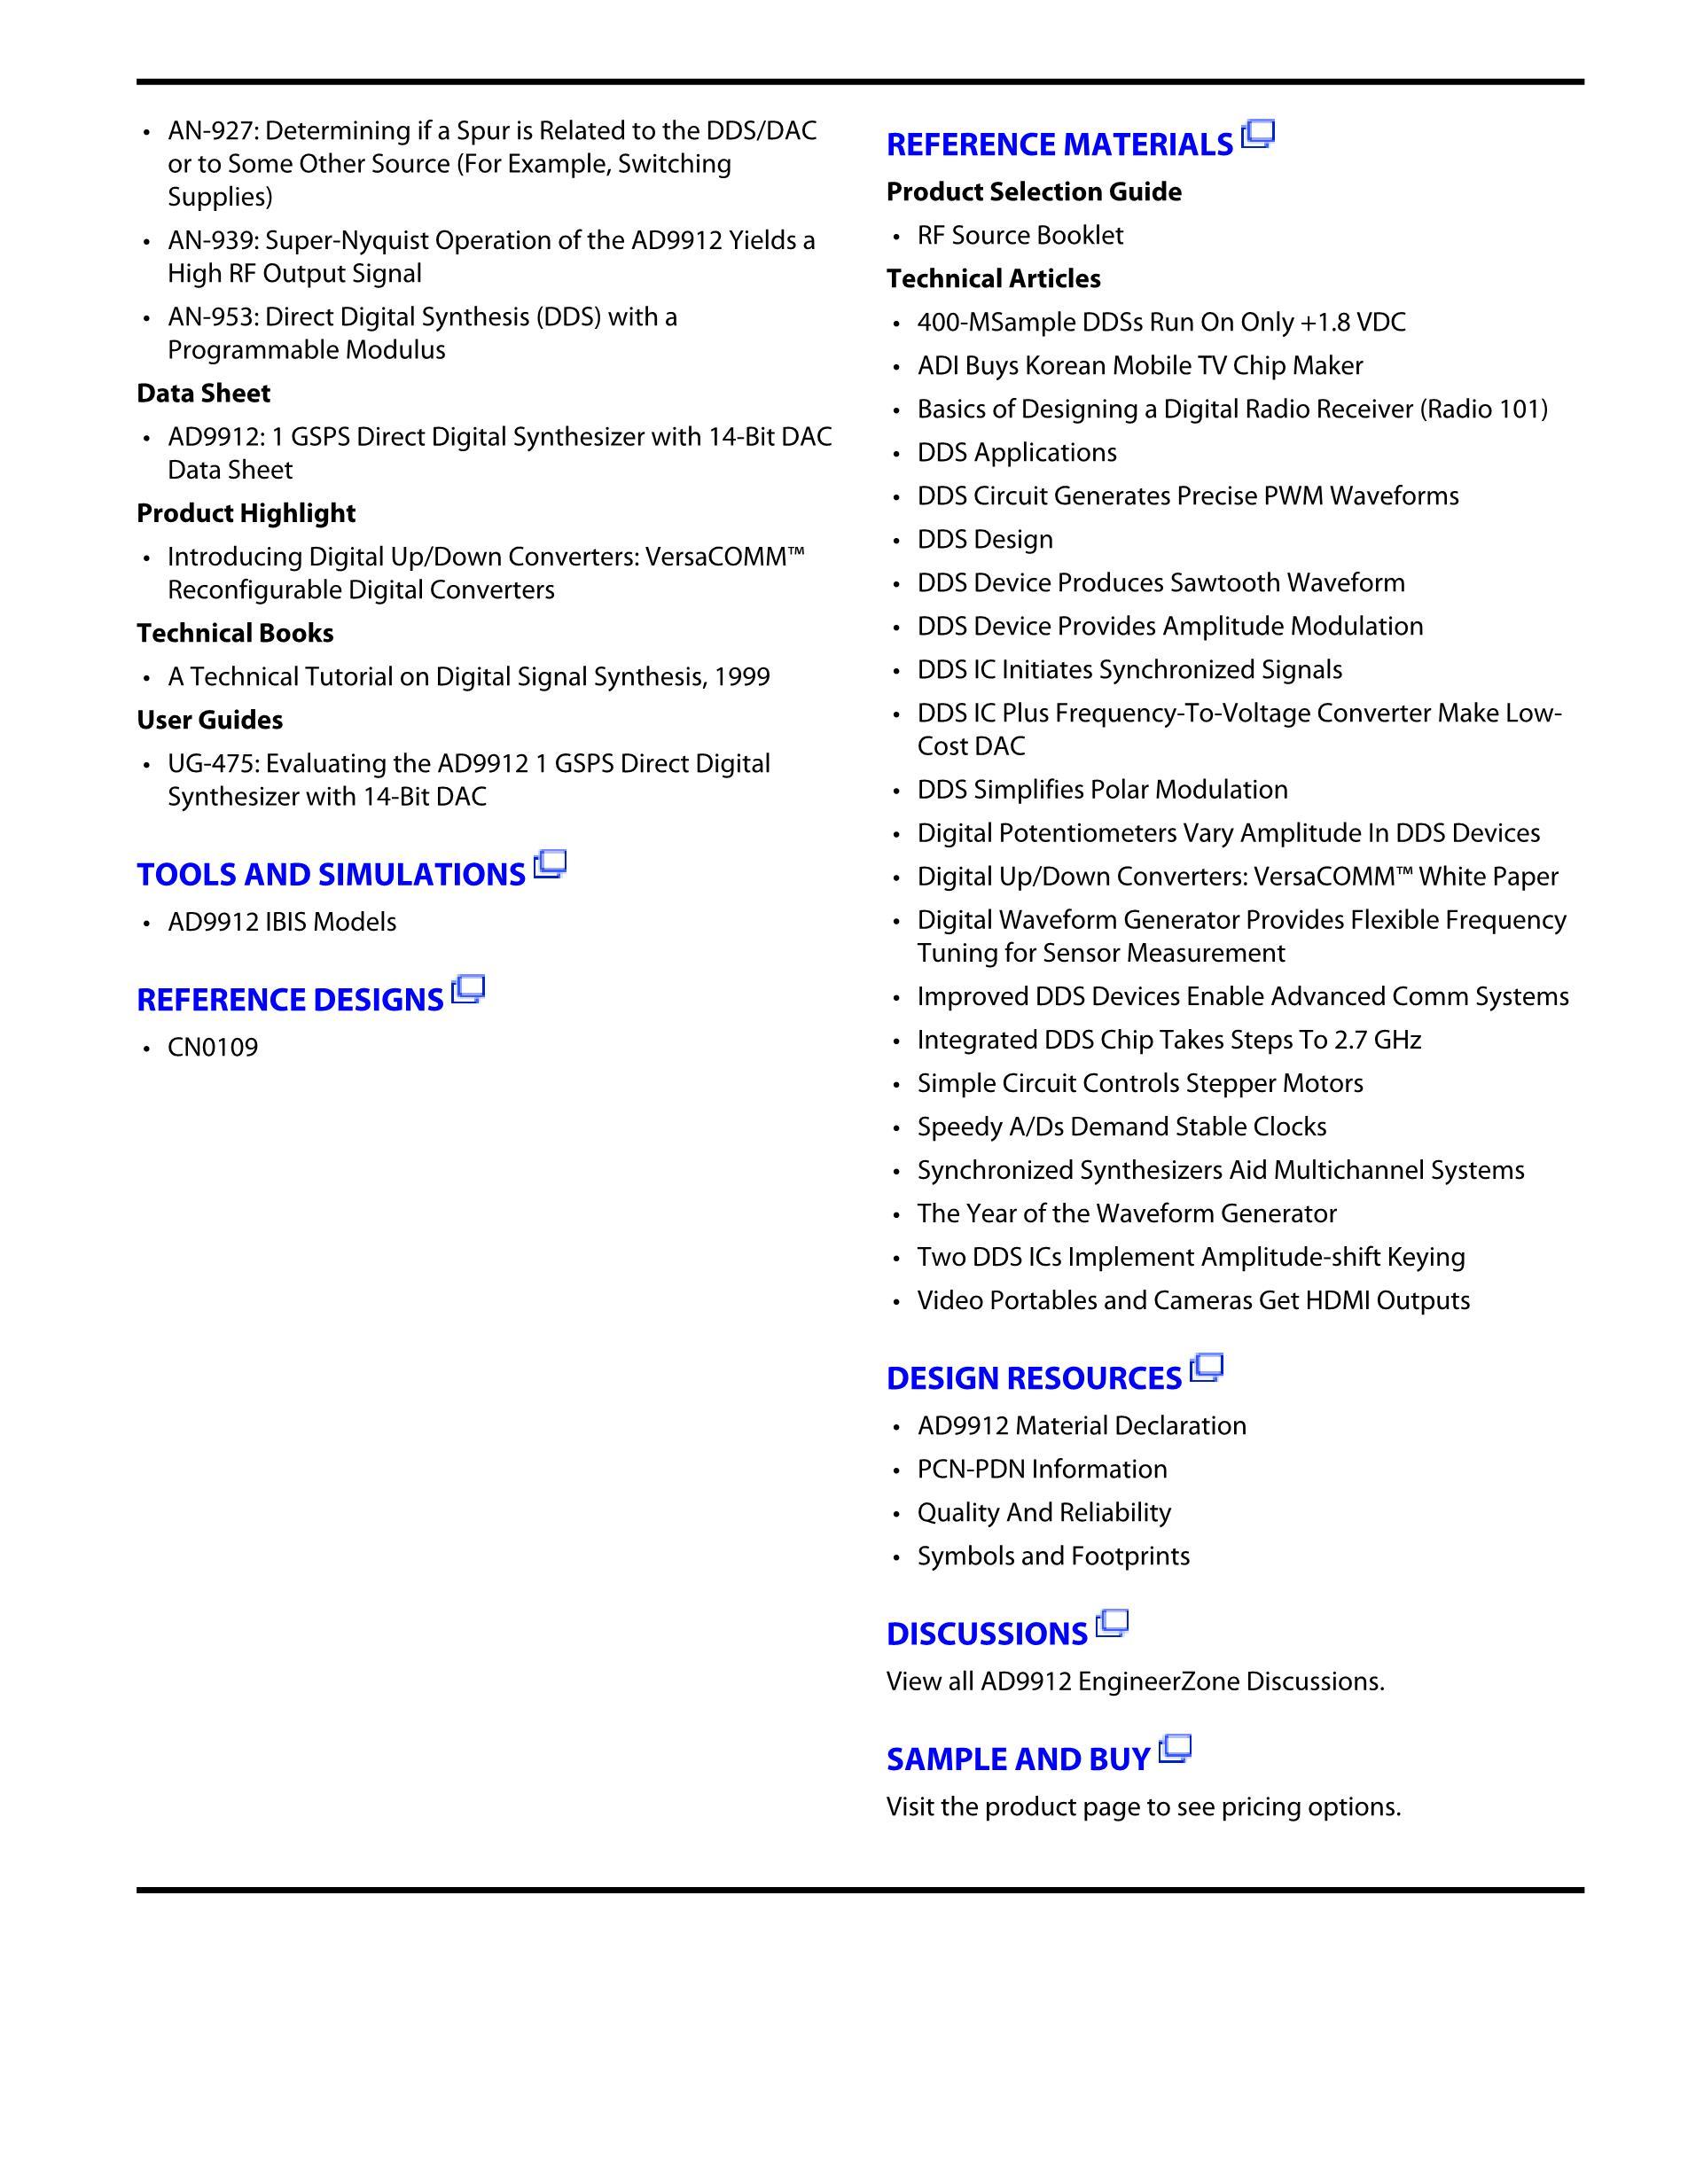 AD9958BCPZ's pdf picture 3